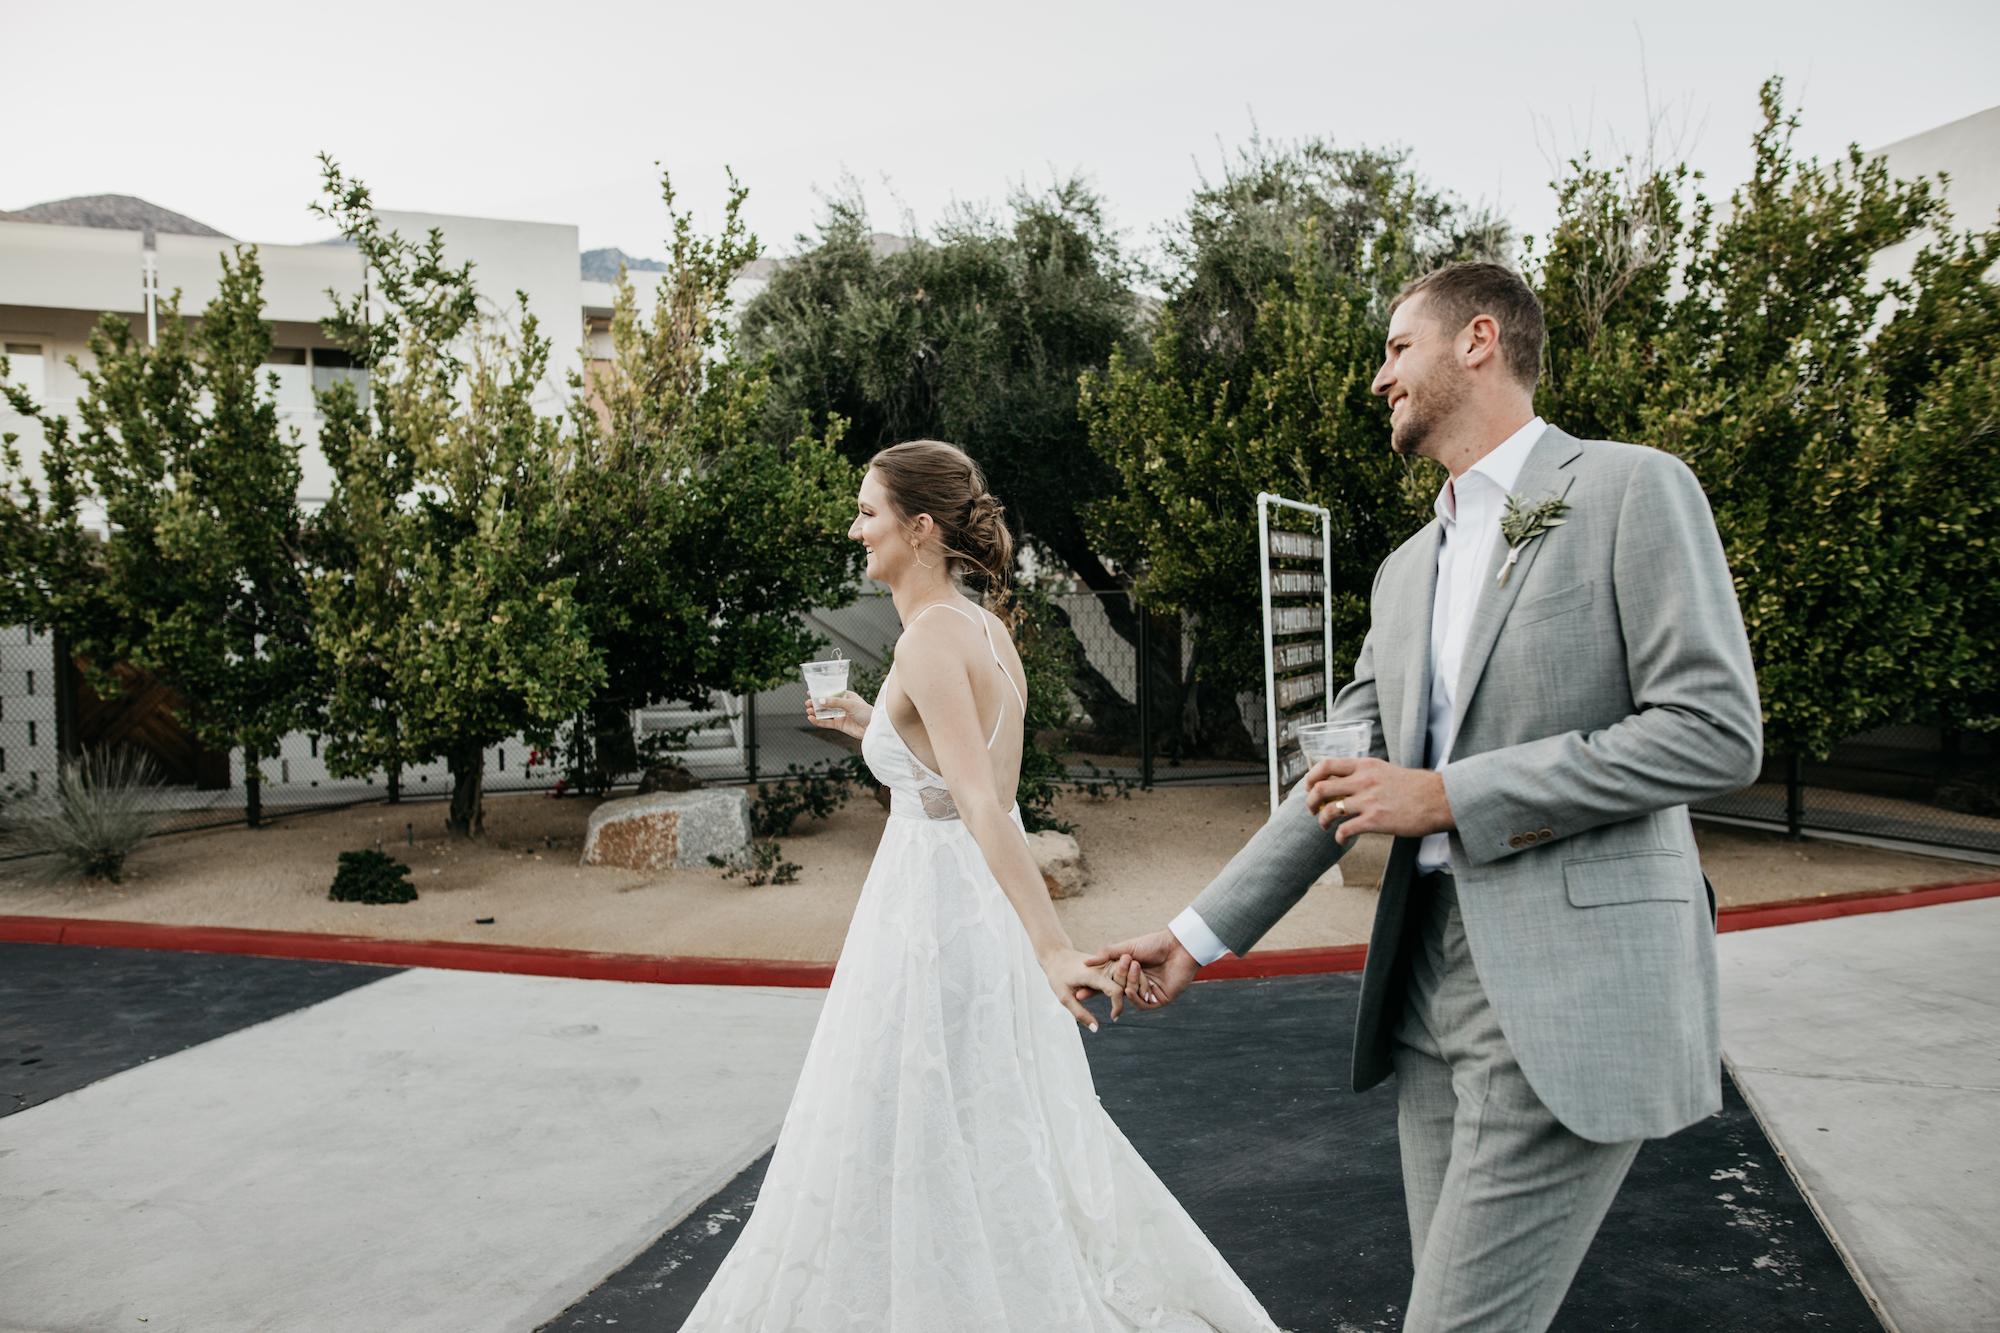 ace-hotel-palm-springs-wedding-photographer672.jpg